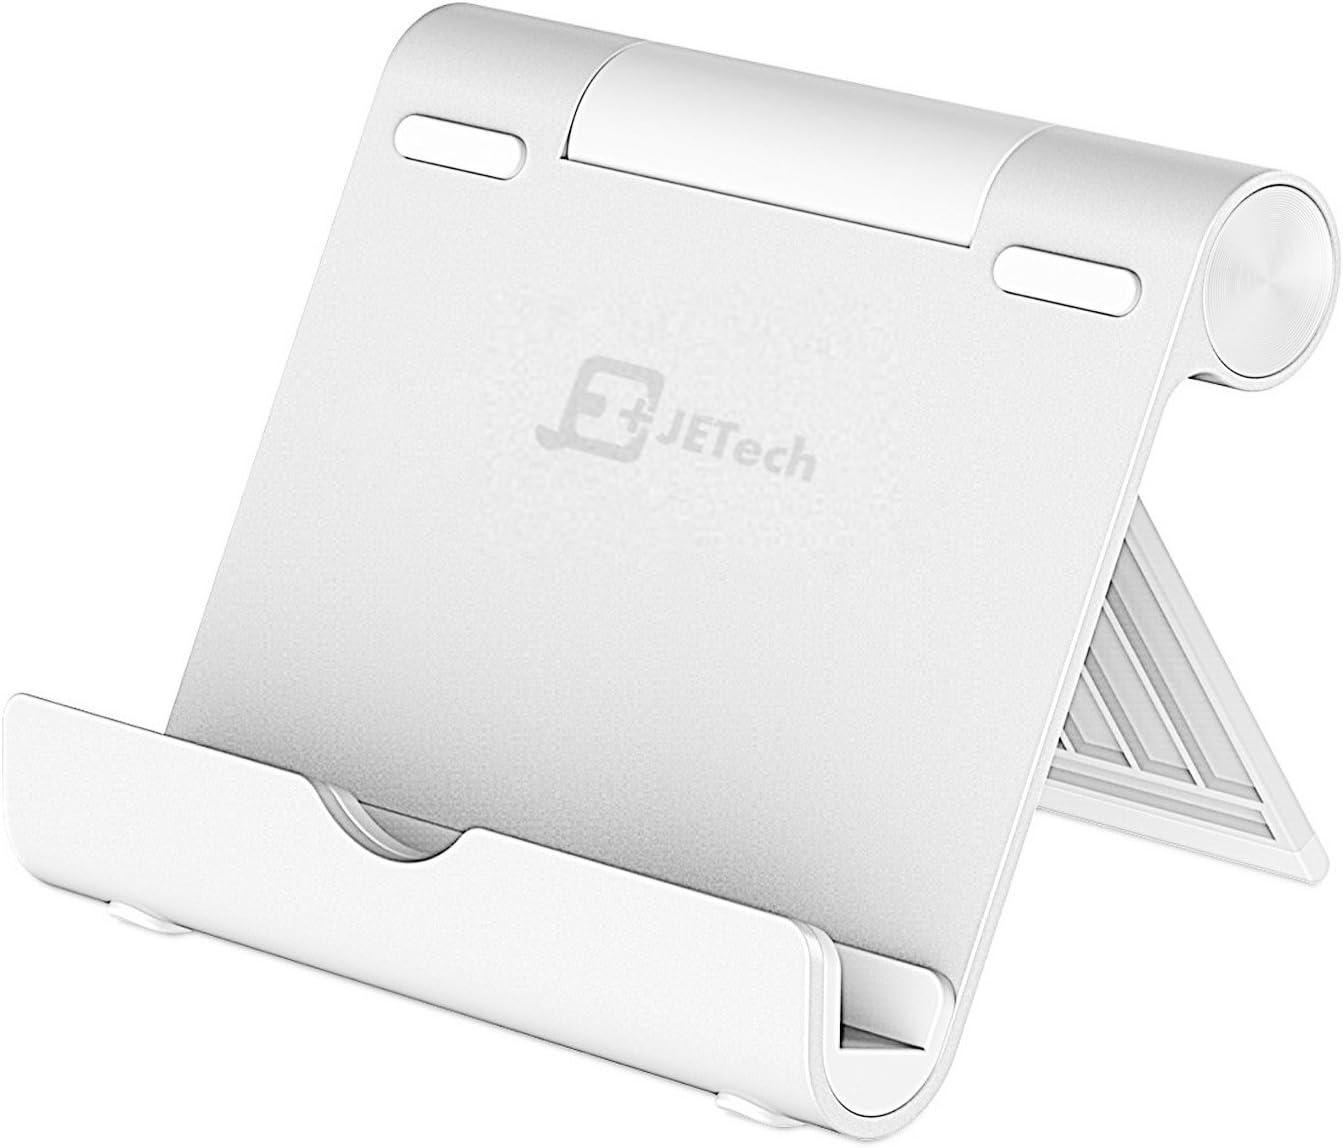 JETech 2061- Soporte Tablet, Multi-Angulo, Portátil Durable Aluminio, Soporte de Móvil y Tableta, Plata